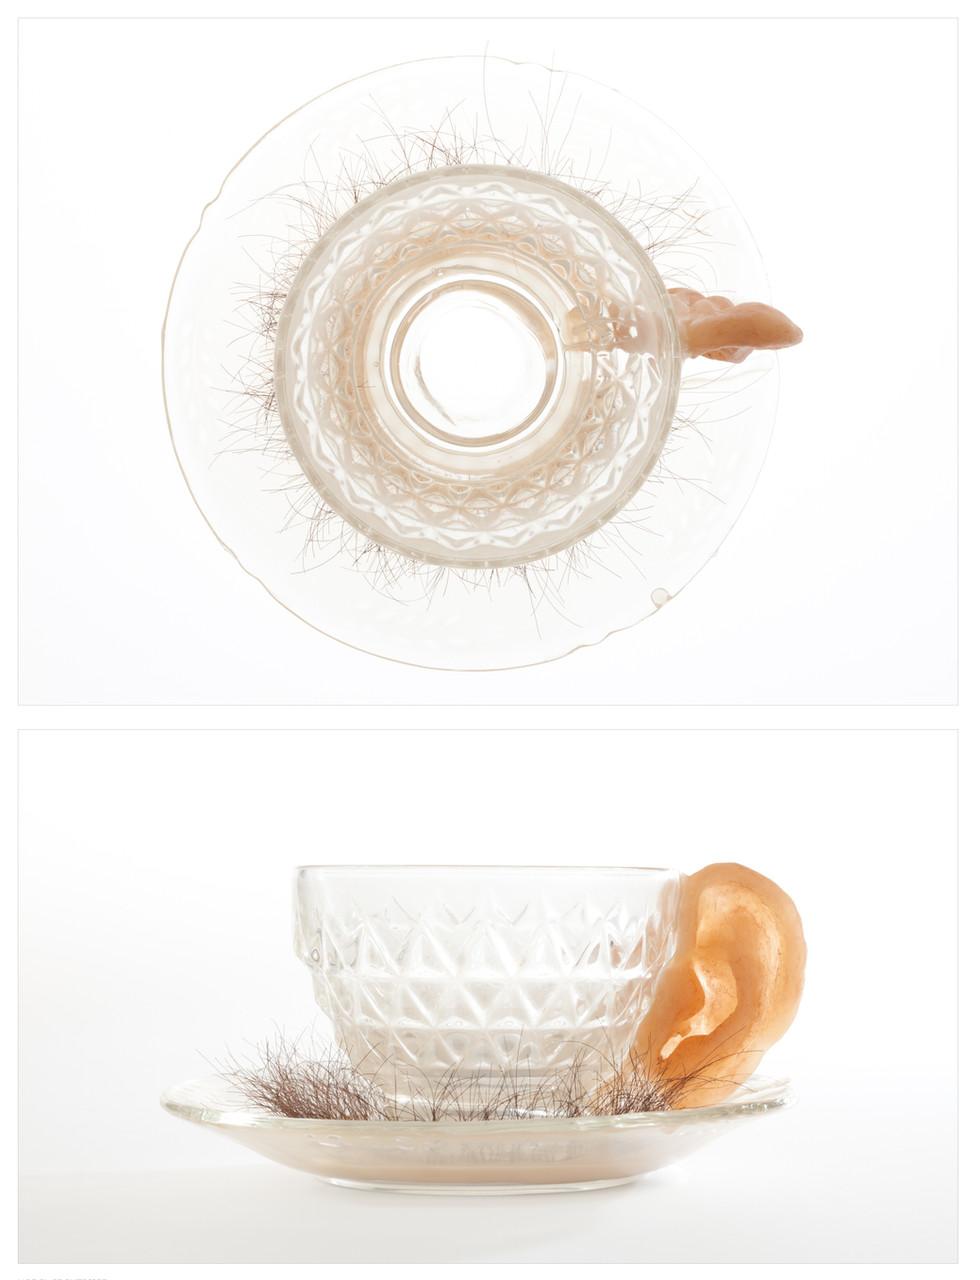 Good Listener Teacup: With Saucer